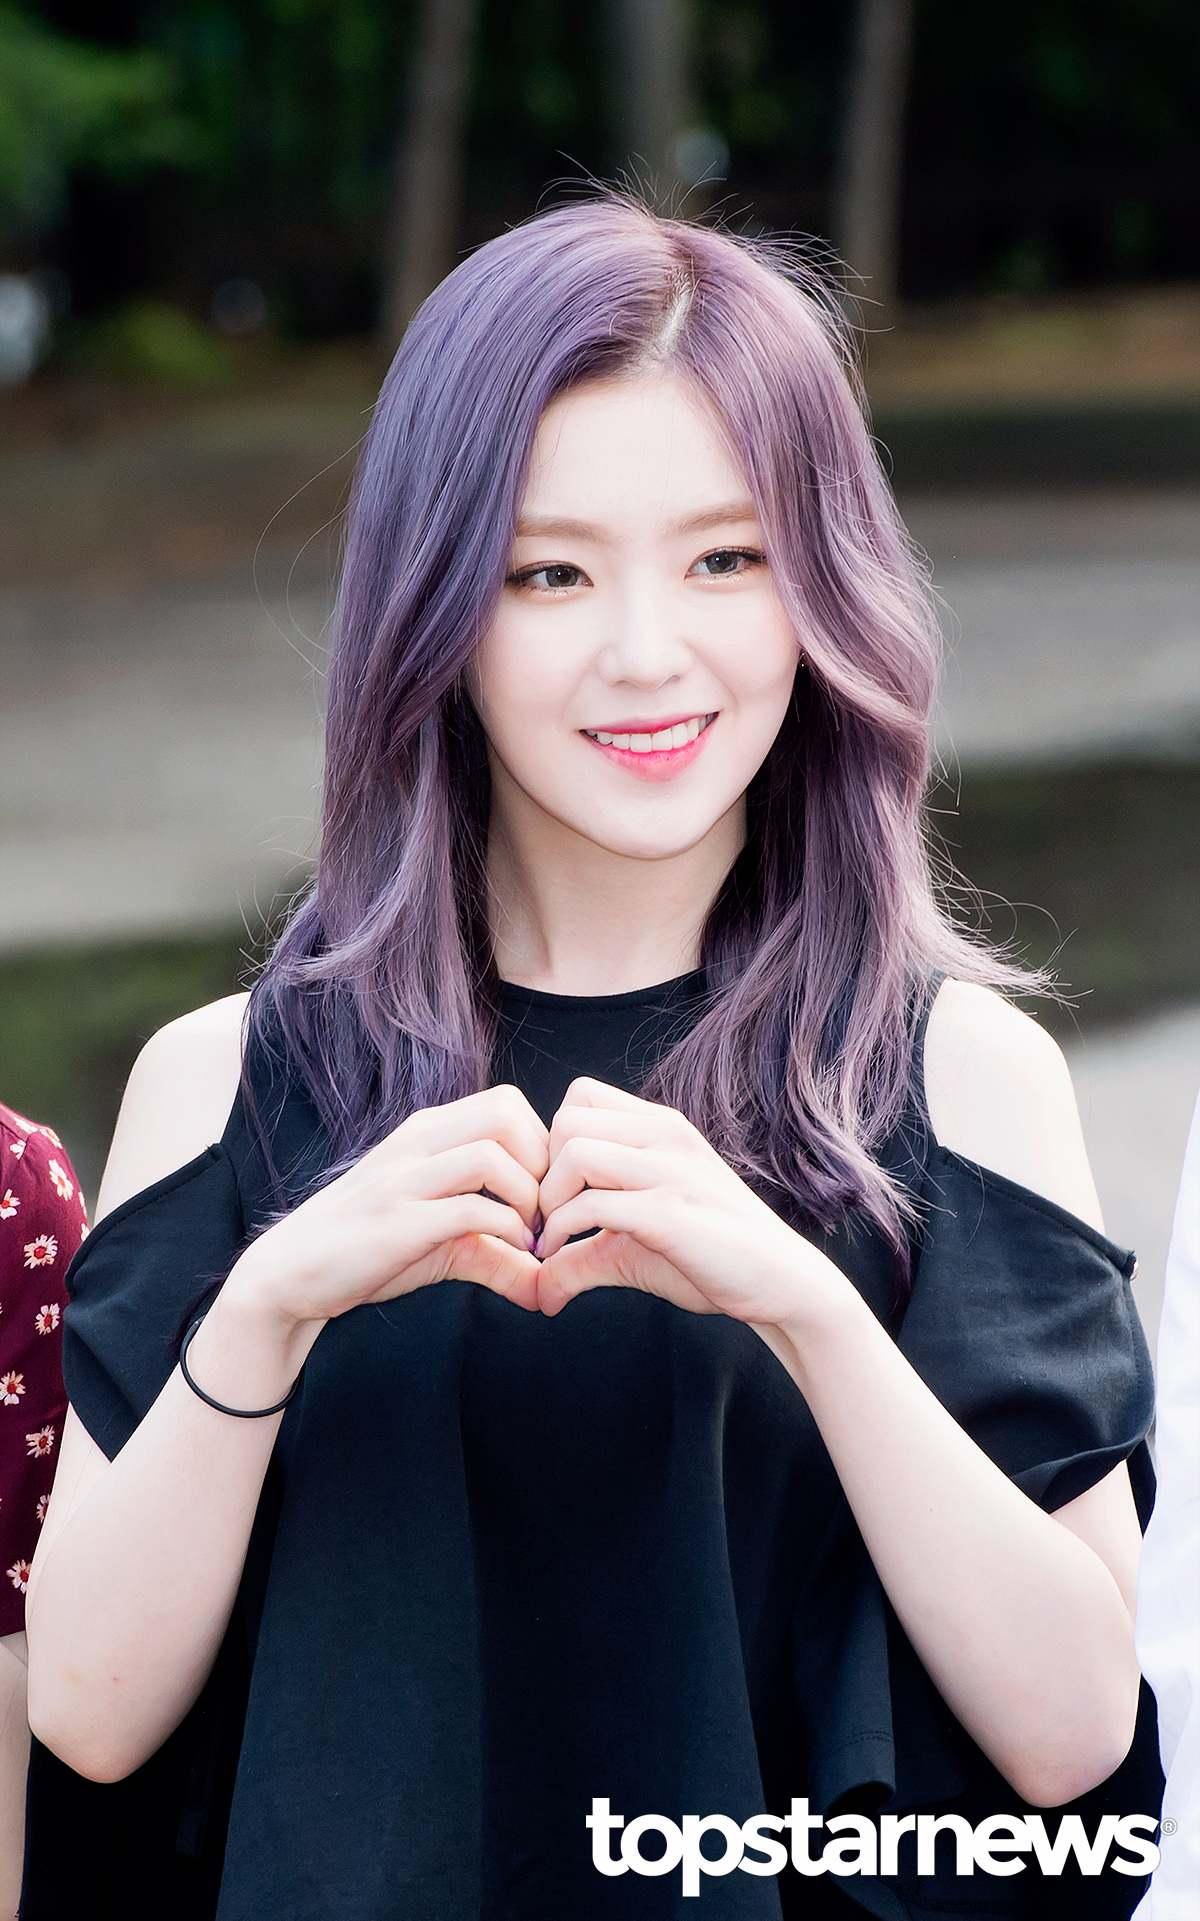 Irene在8日出演的SBS Radio PowerM《兩點逃出Cultwo Show》中,被稱讚像洋娃娃一樣的外貌,Irene卻謙虛的回答說「在大邱(Irene的家鄉)有很多漂亮的人 」。